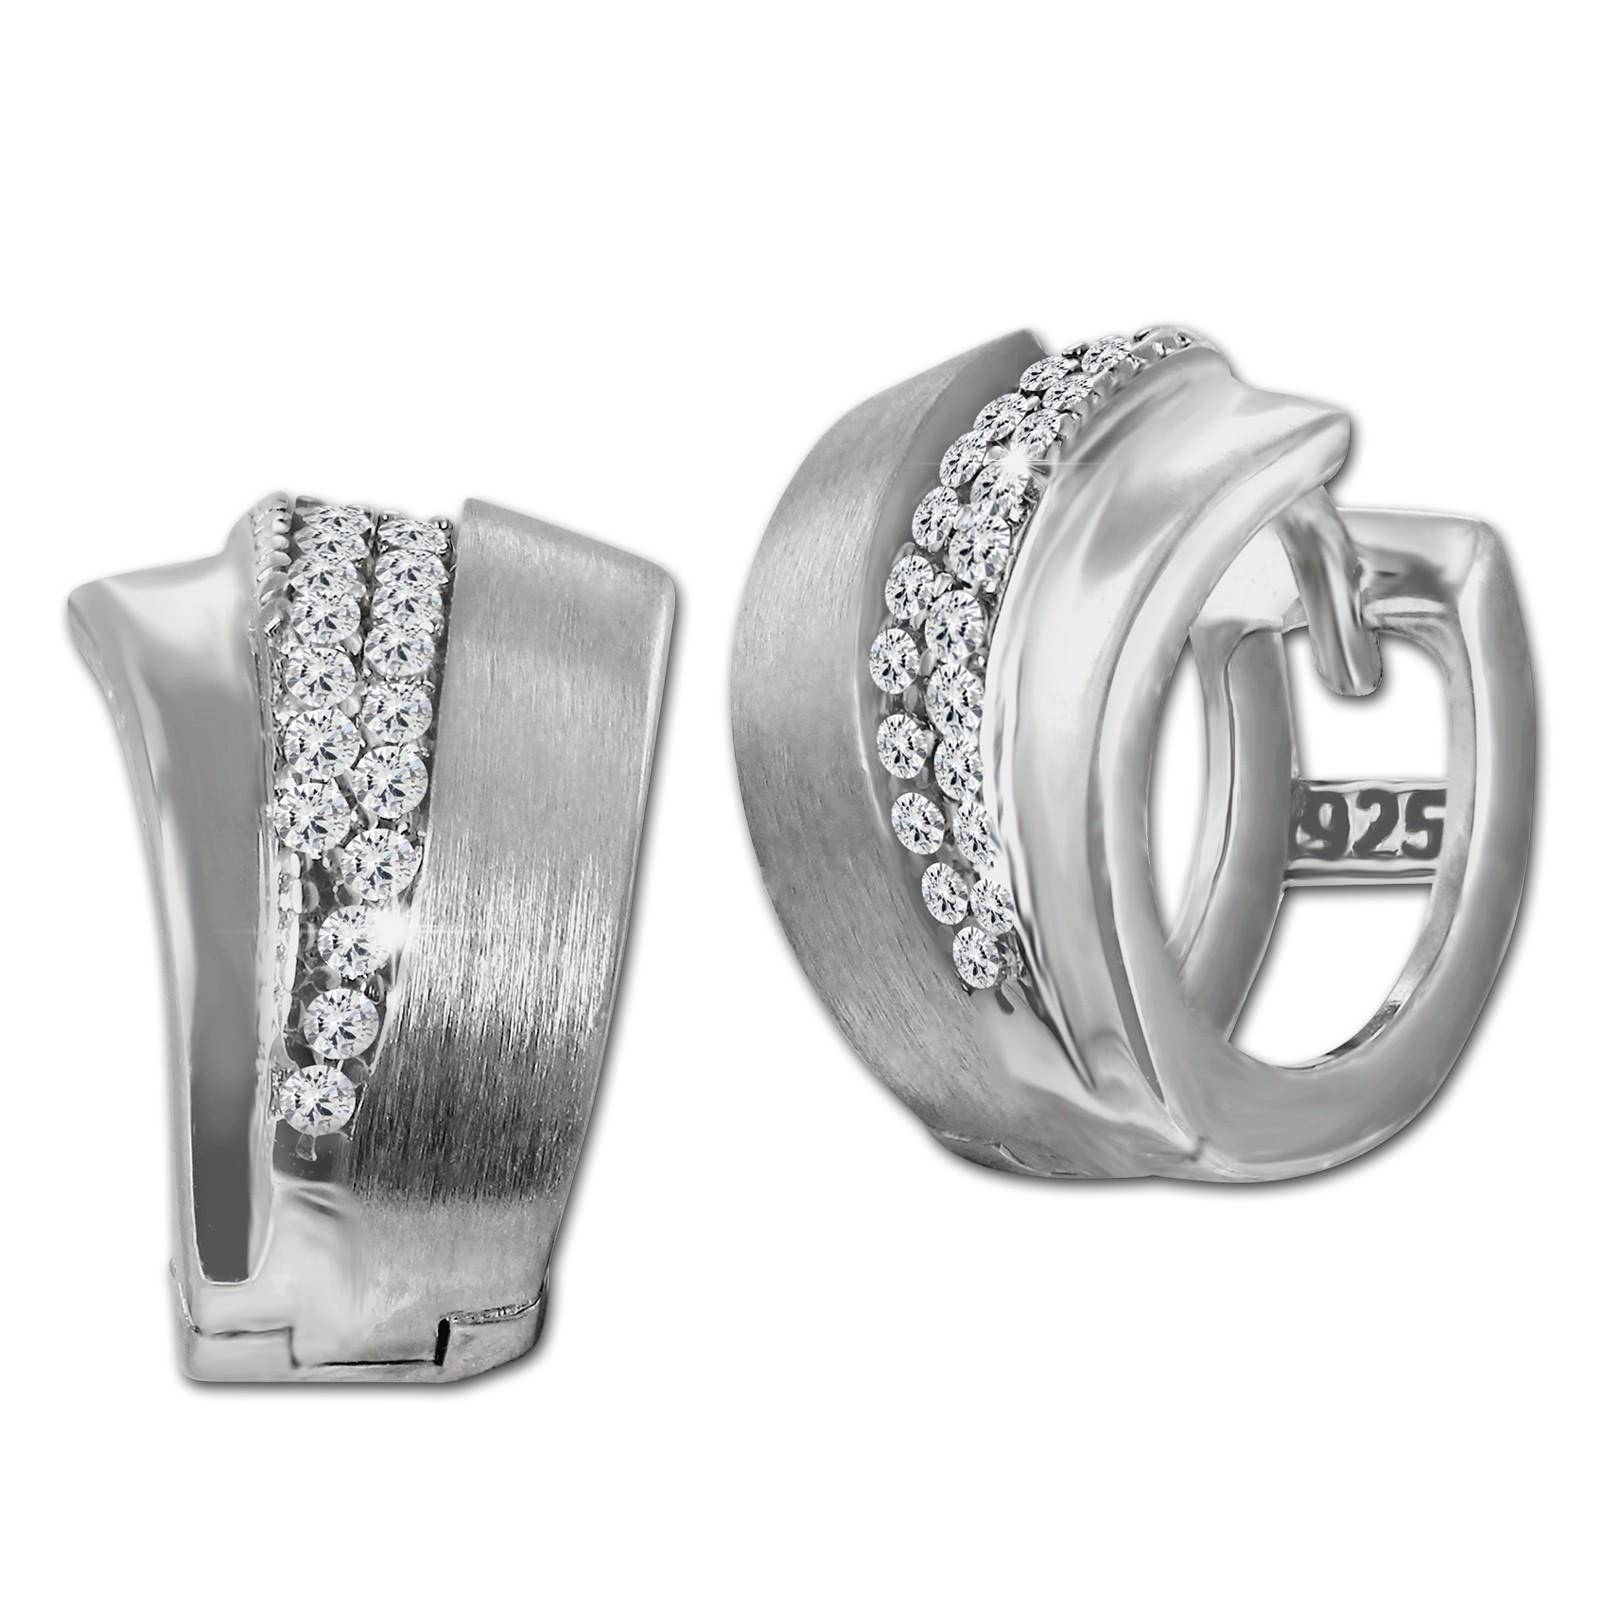 SilberDream Creole Fächer Zirkonia weiß 925 Sterling Silber Damen SDO4368W